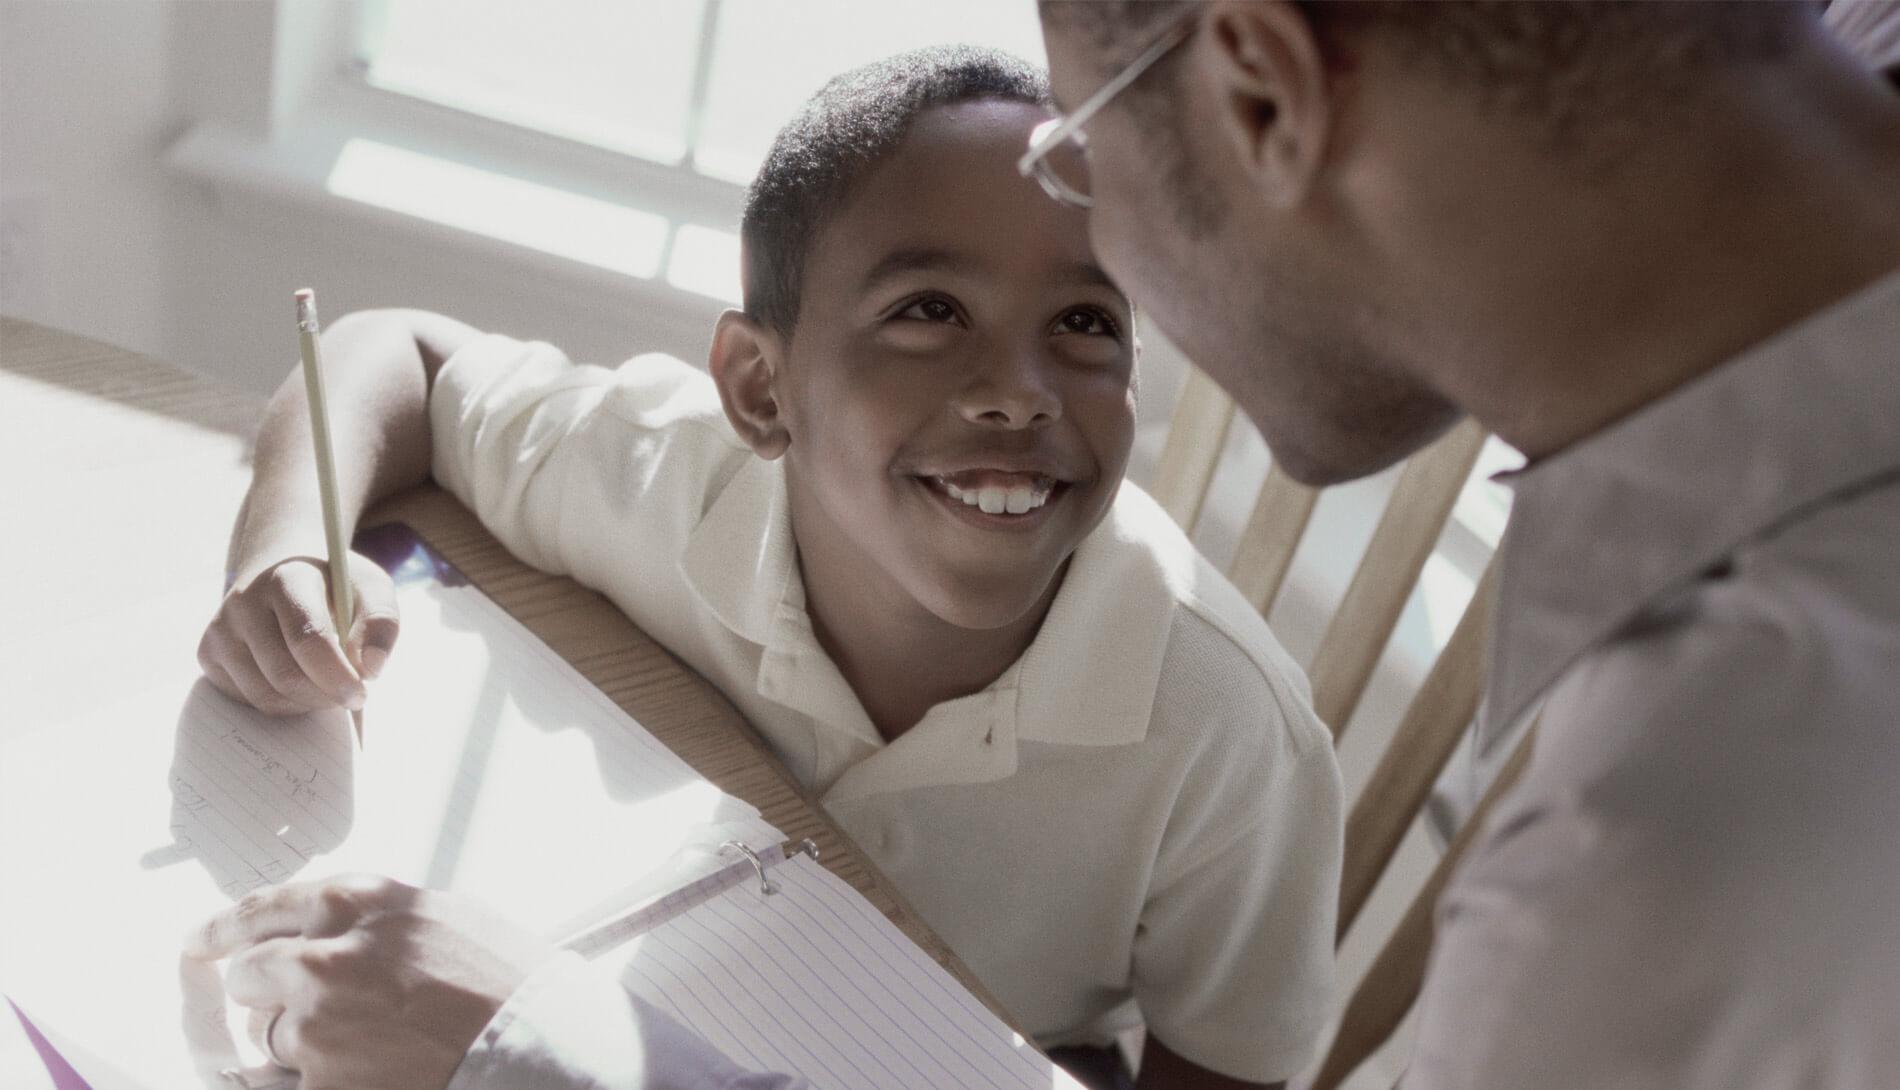 Smiling child studying